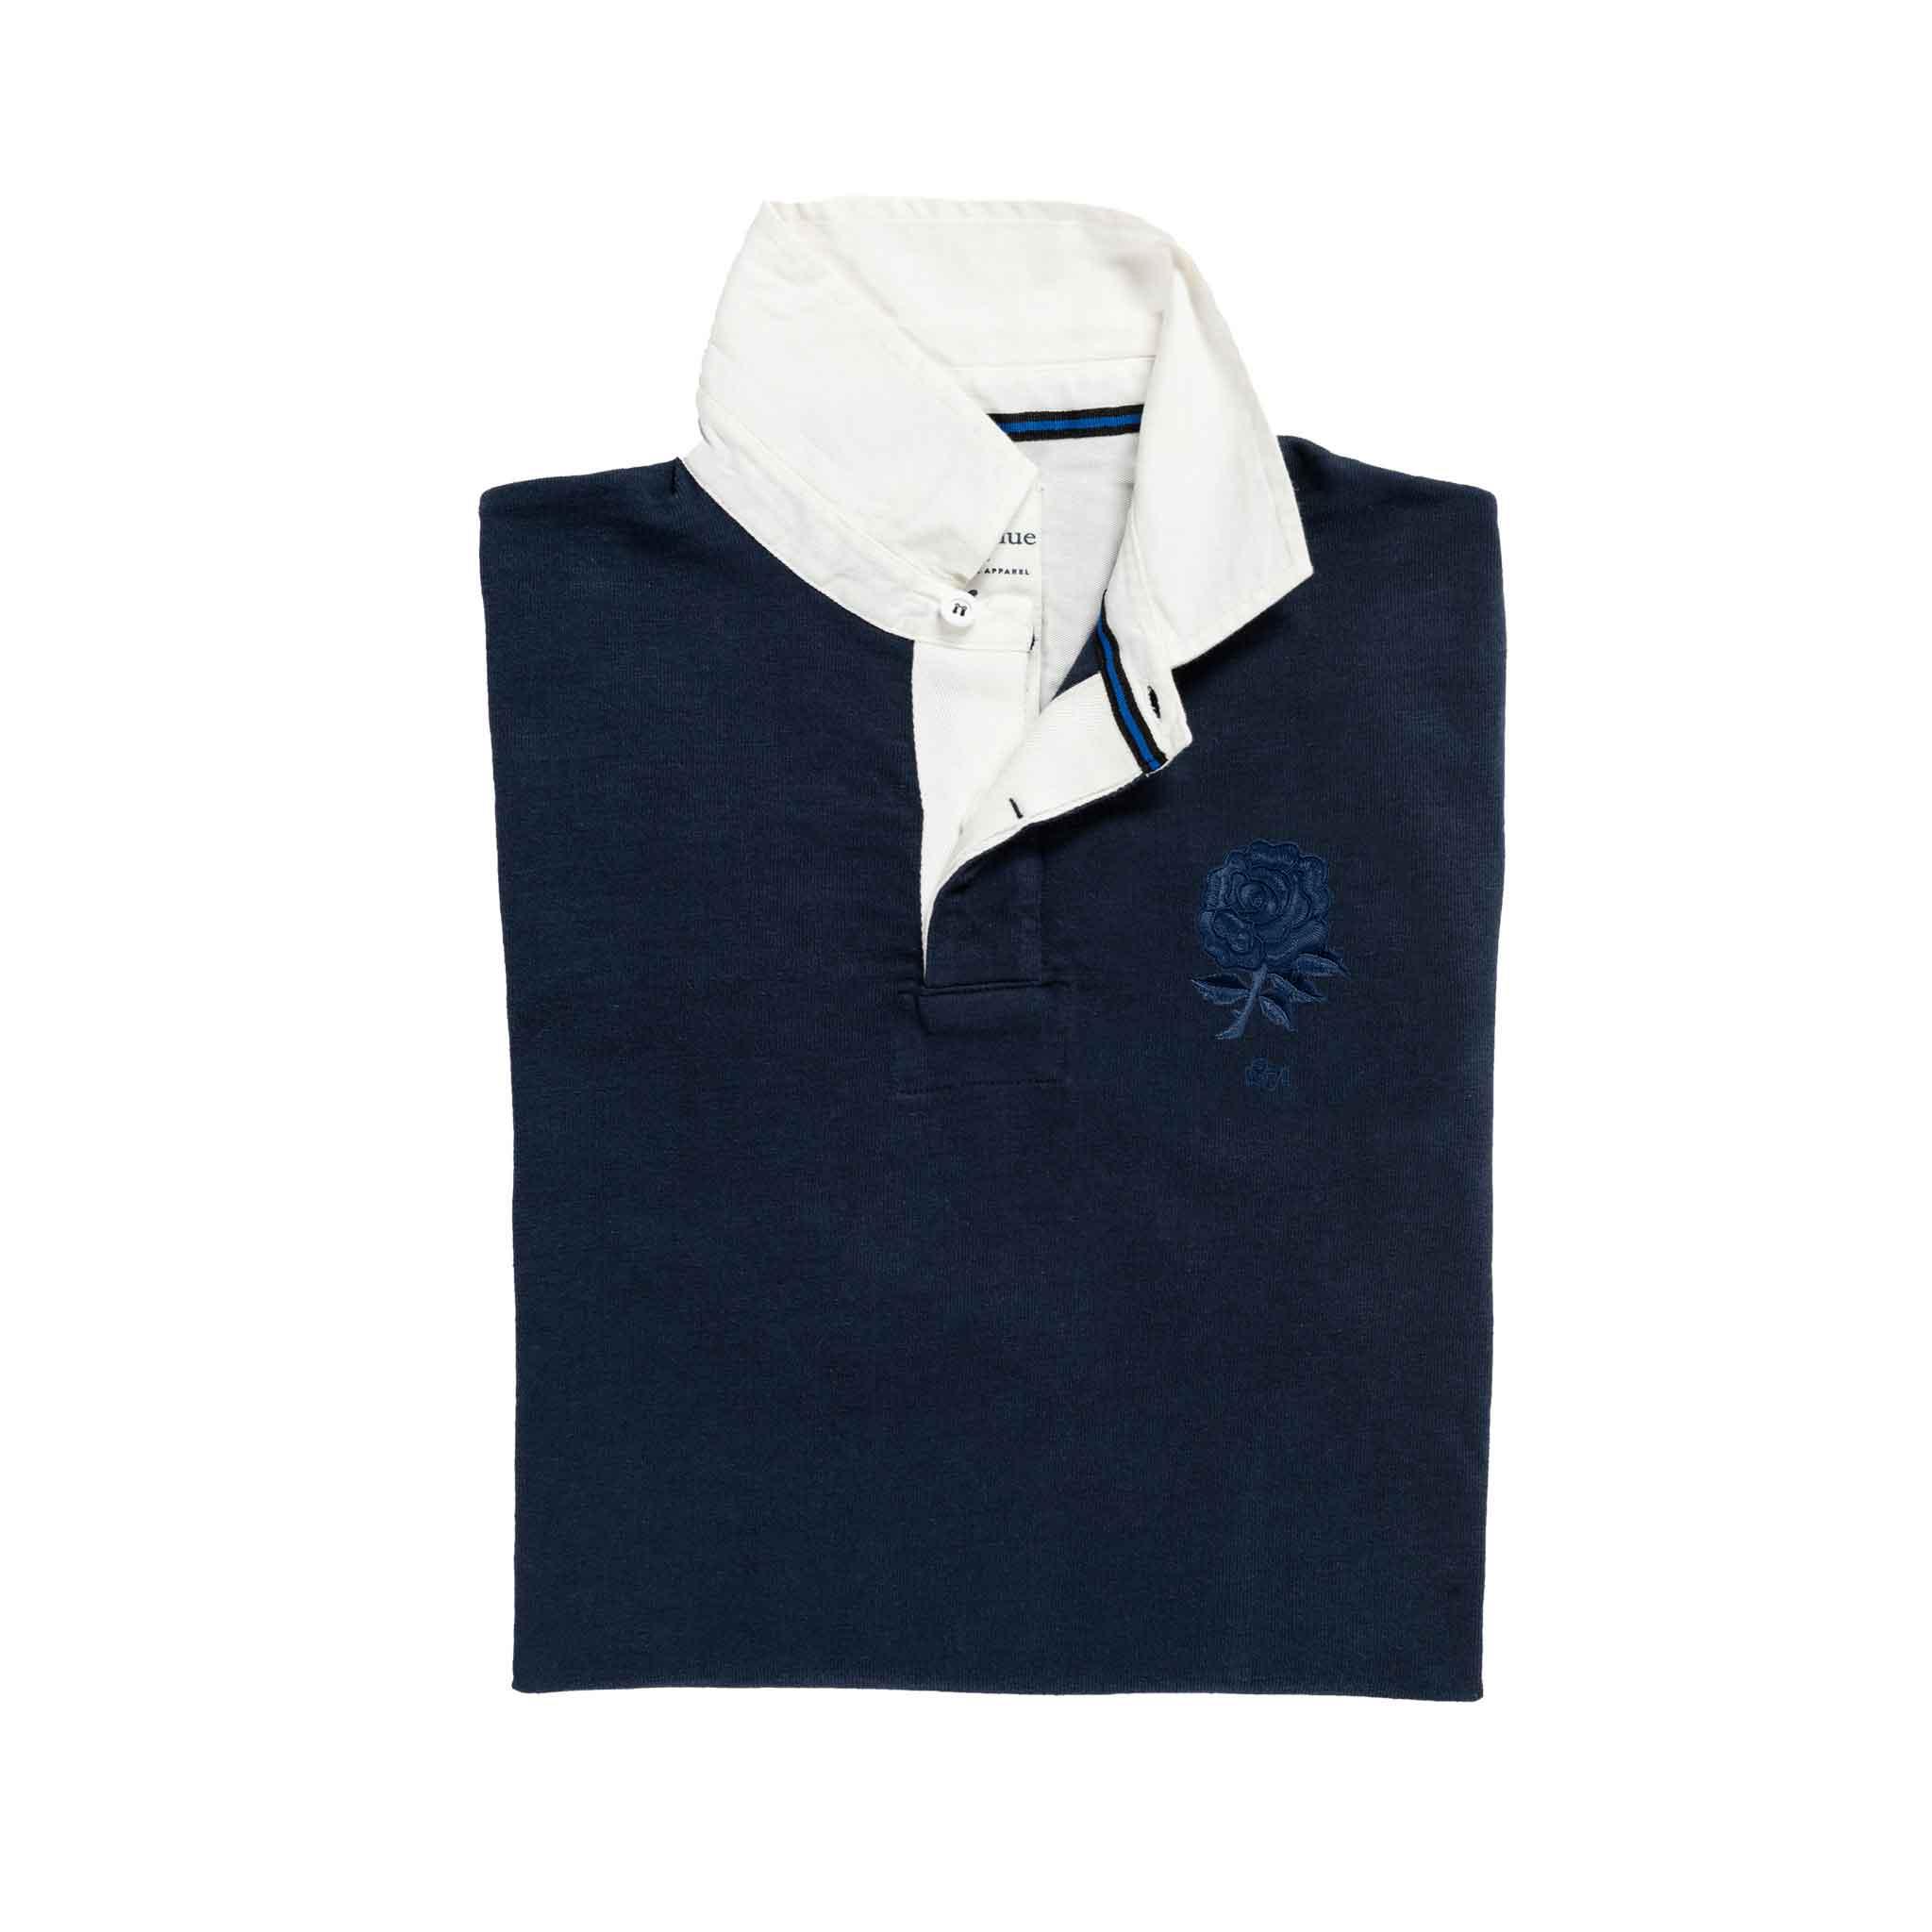 England 1871 Rugby Shirt_NBL_Folded